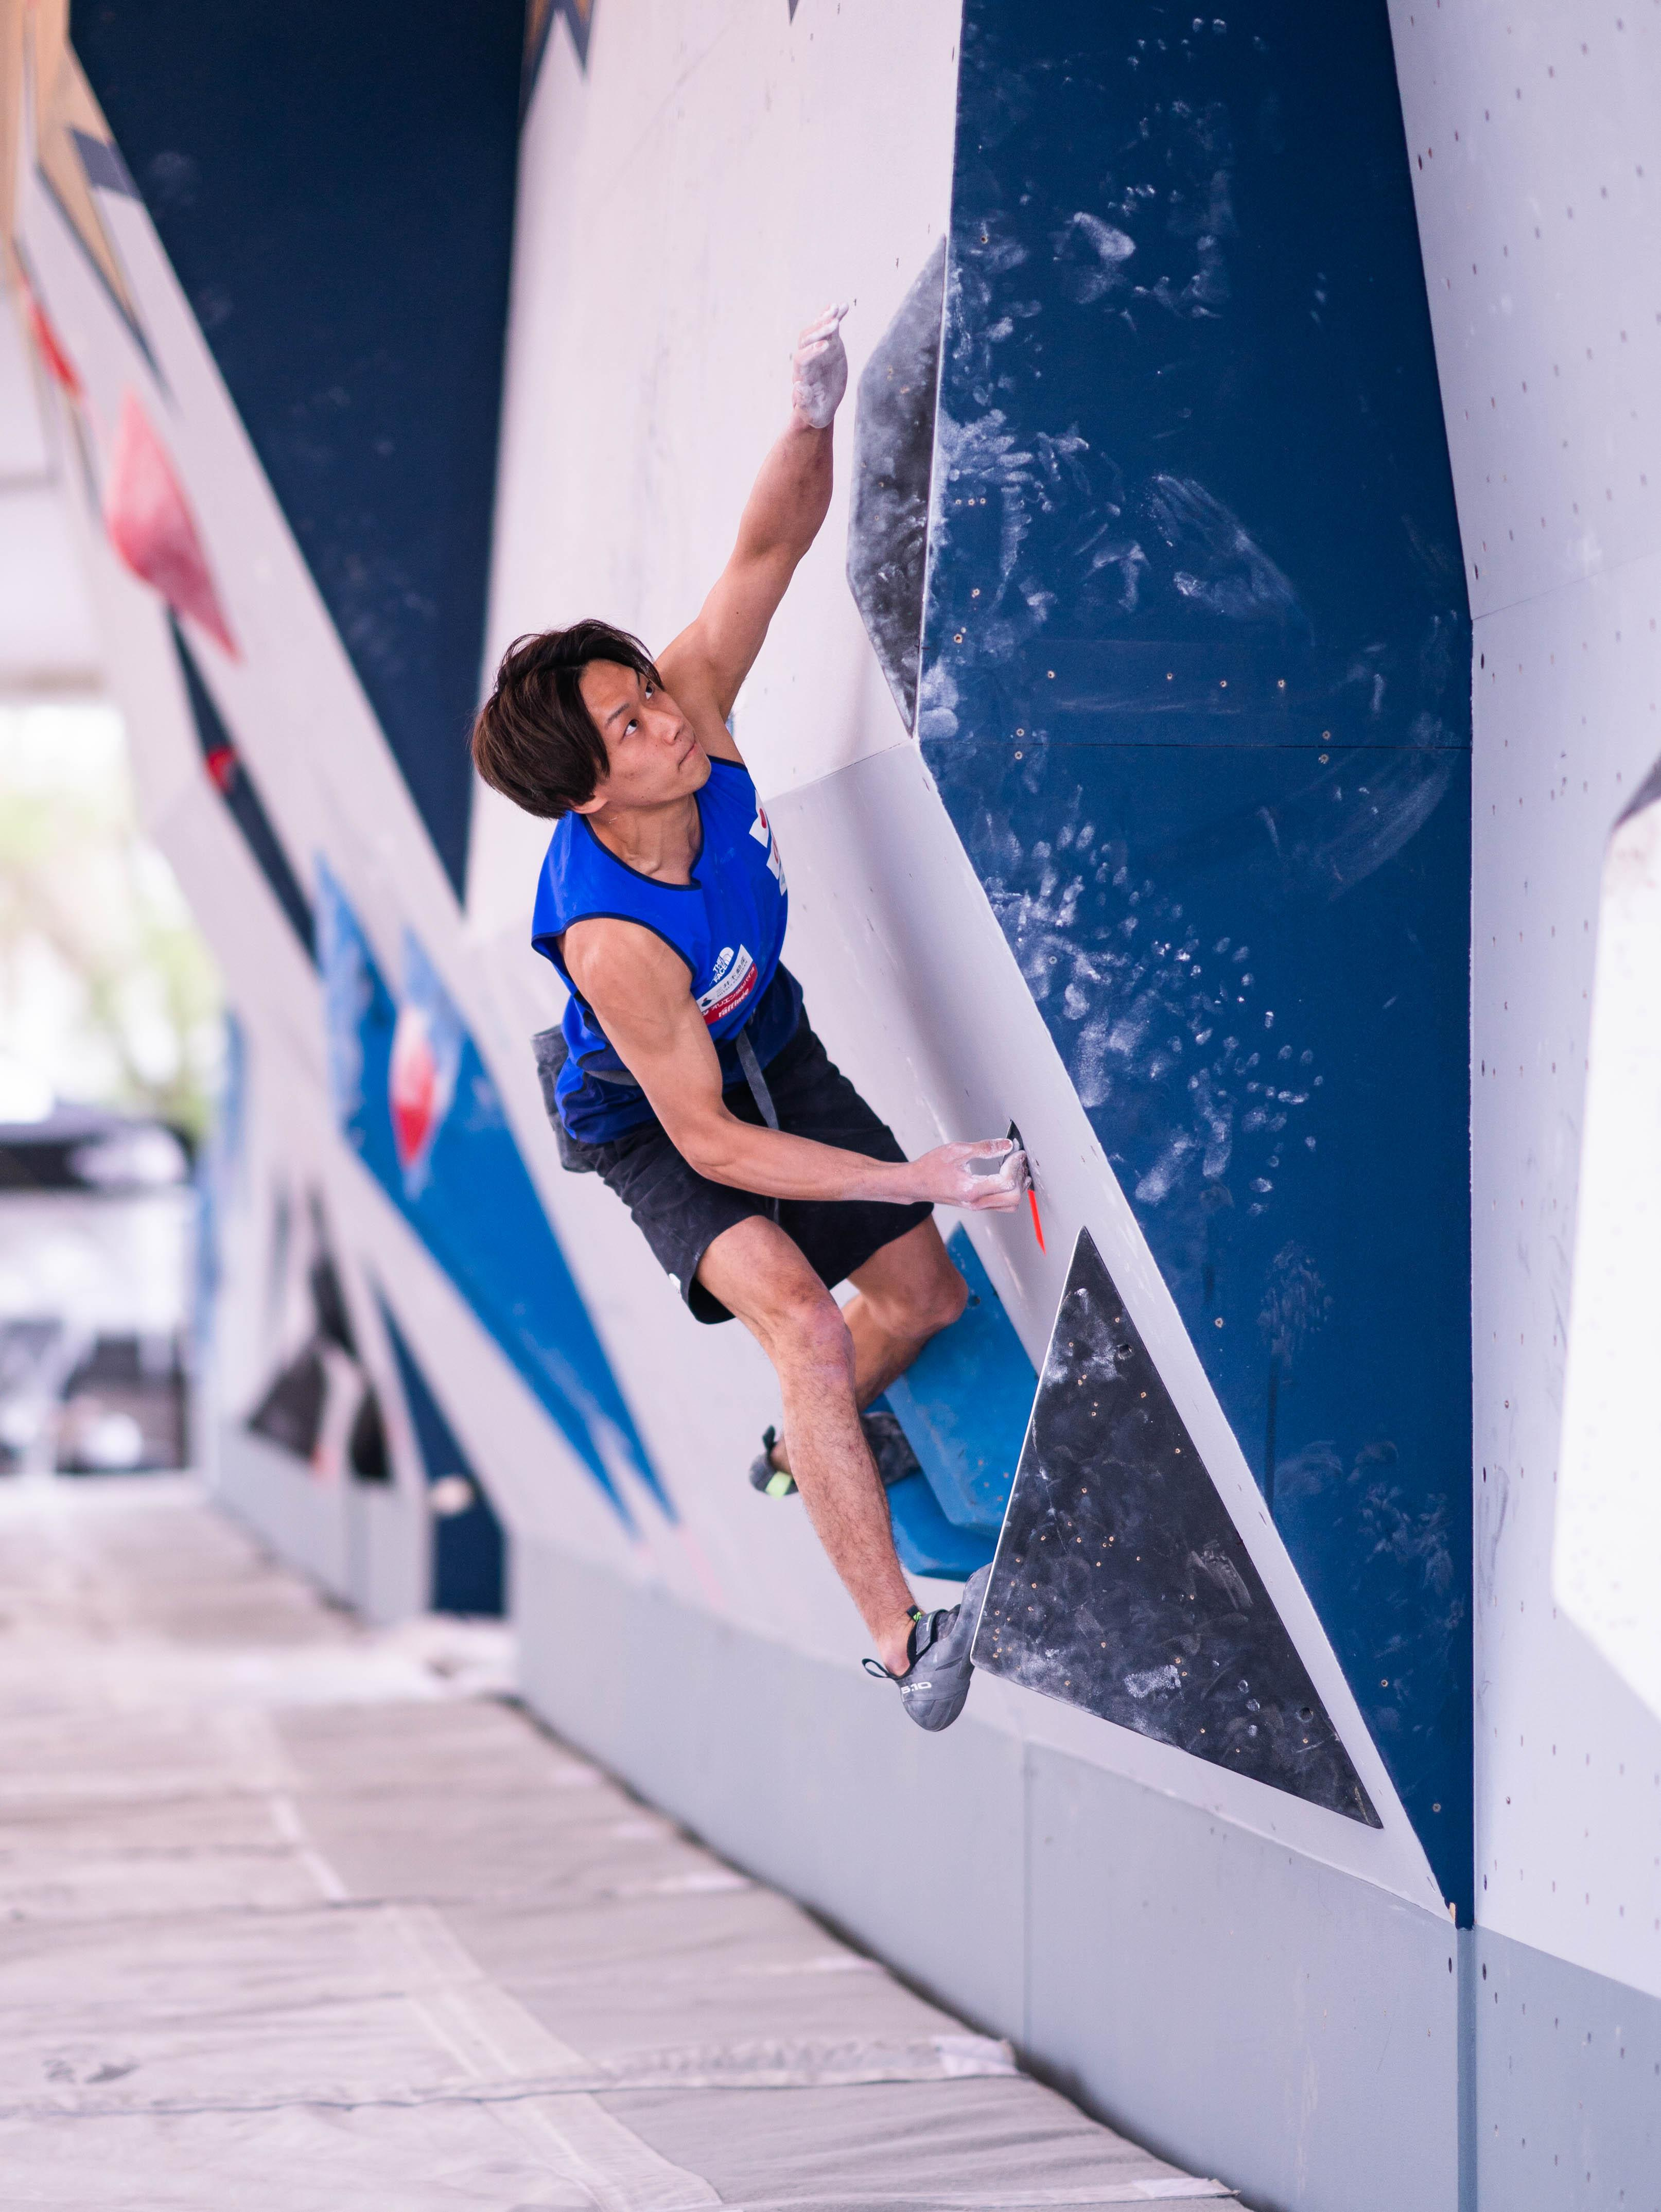 210521 IFSC News Ogata Ondra sweep the mens boulder qualification in Salt Lake City